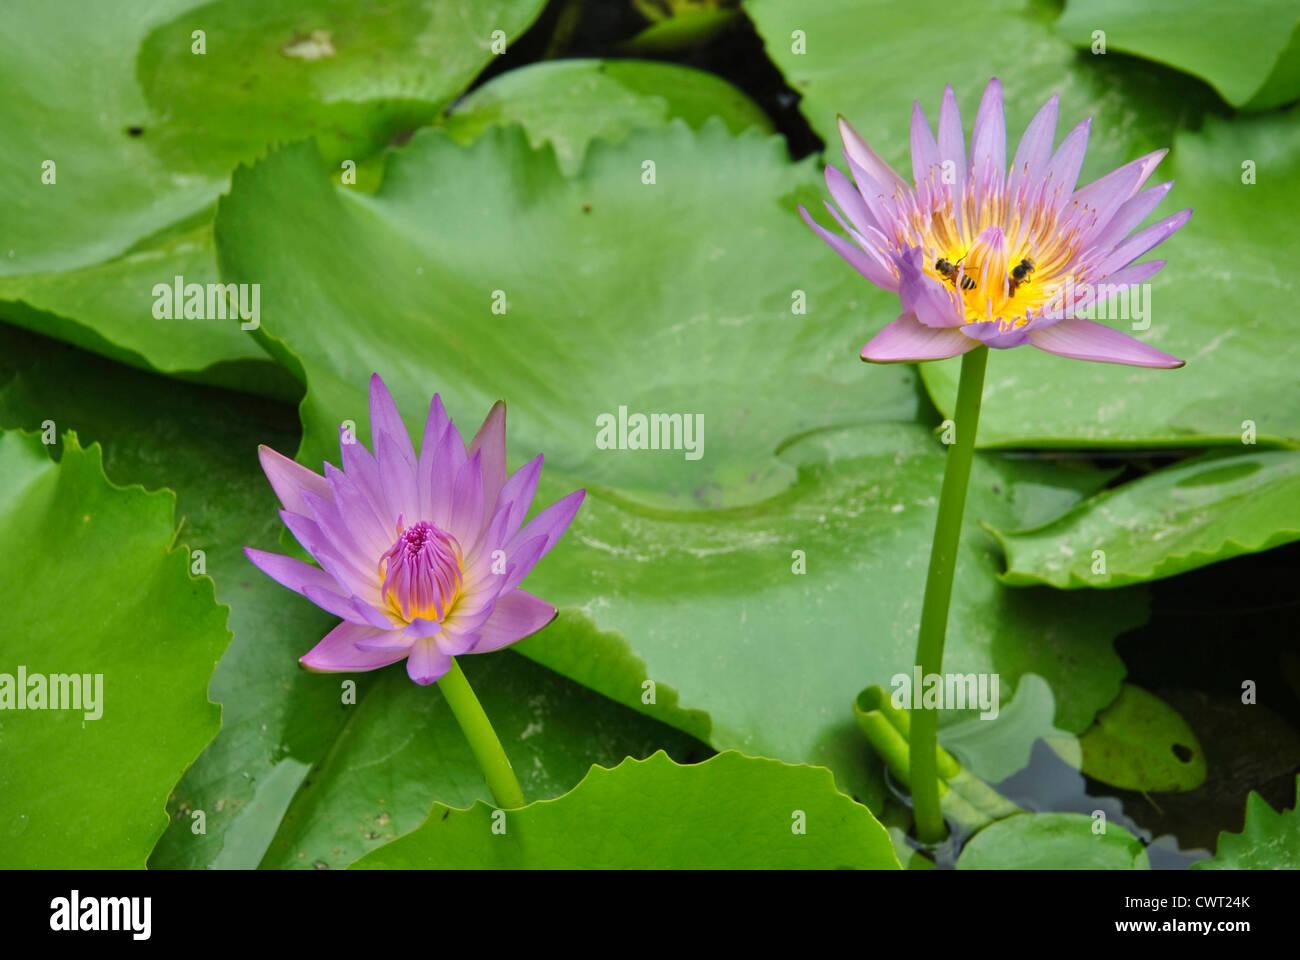 Lotus Flower Blossom Stock Photo 50315683 Alamy